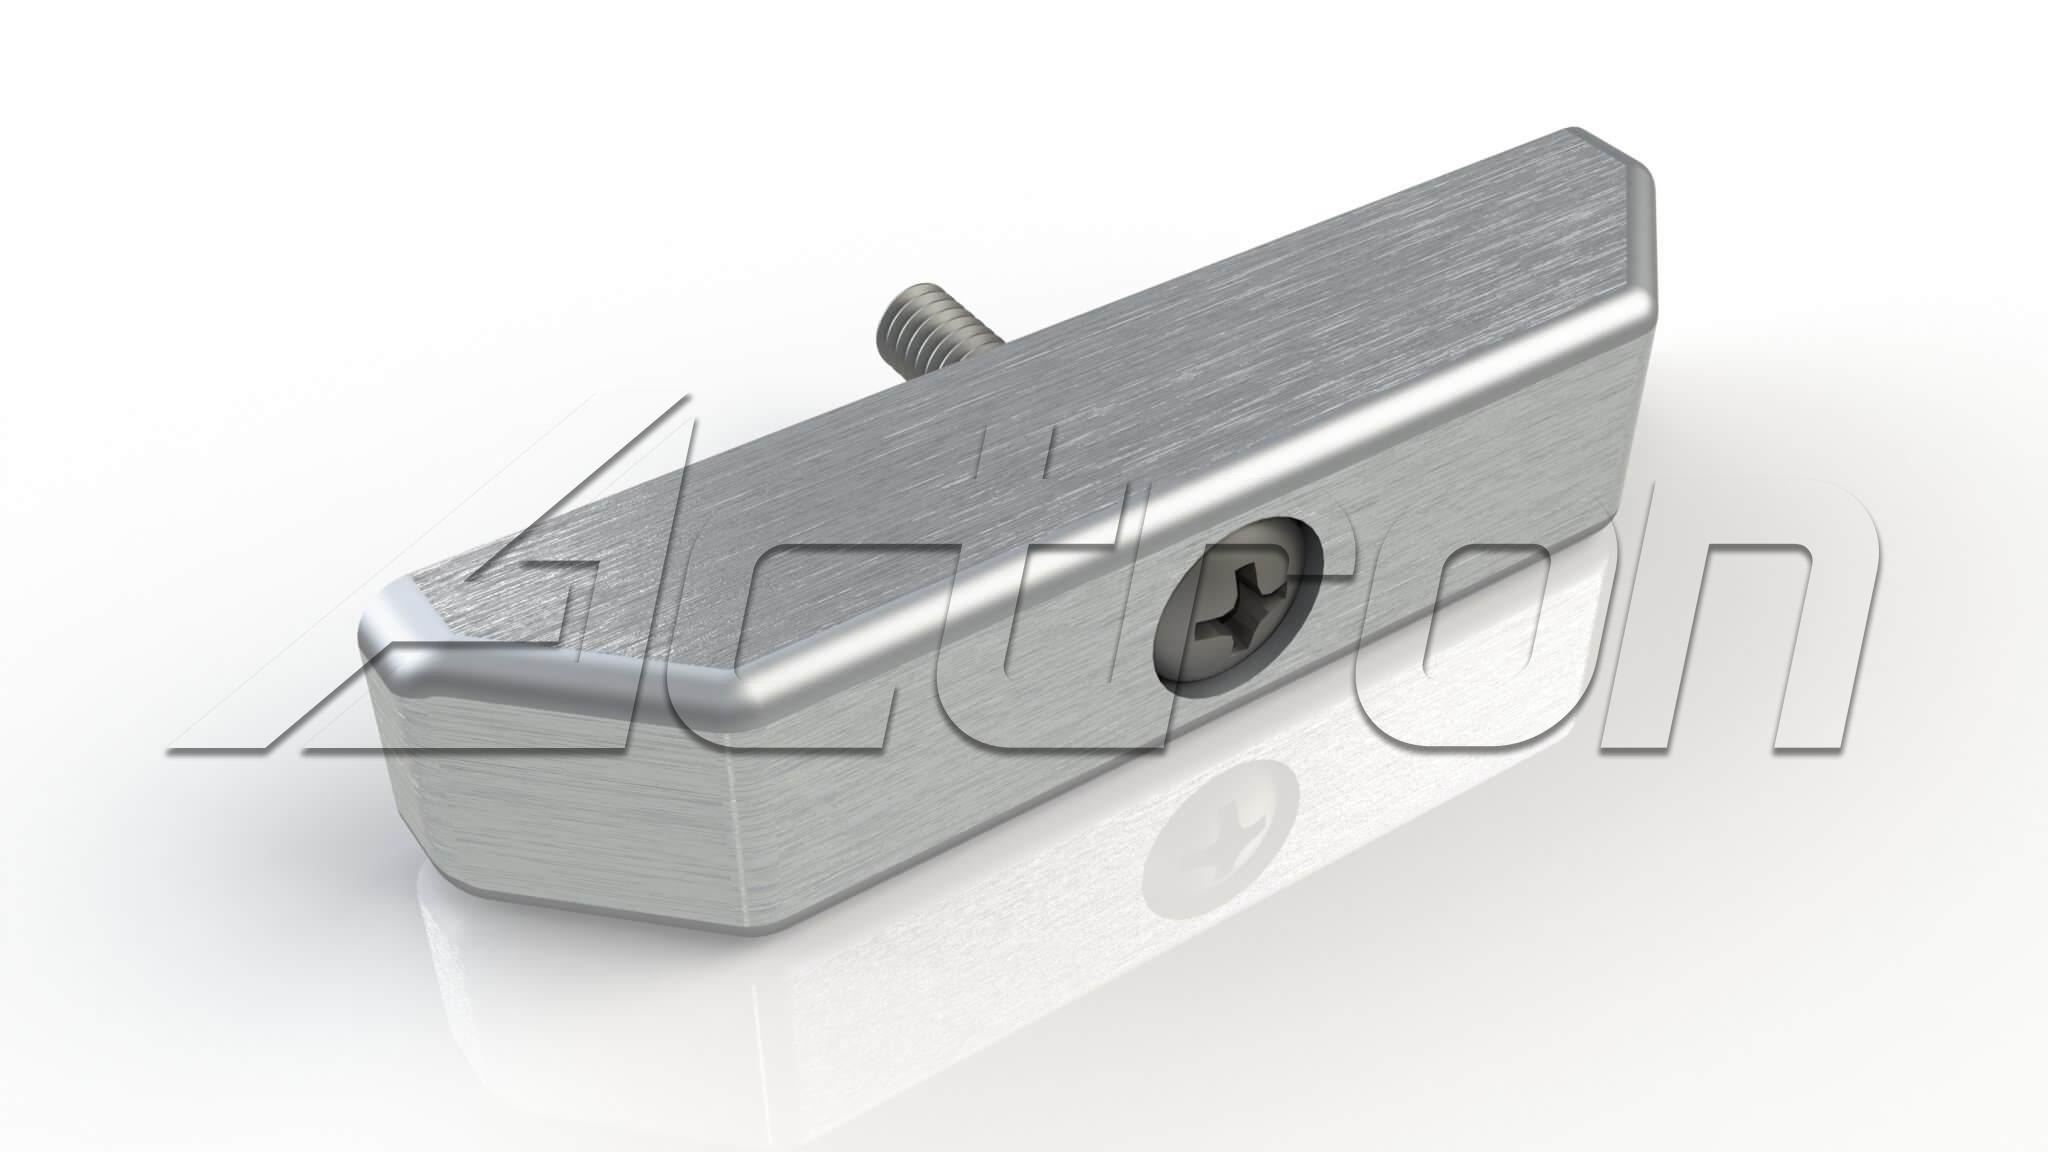 1-4-turn-retainer-4787-a35563.jpg